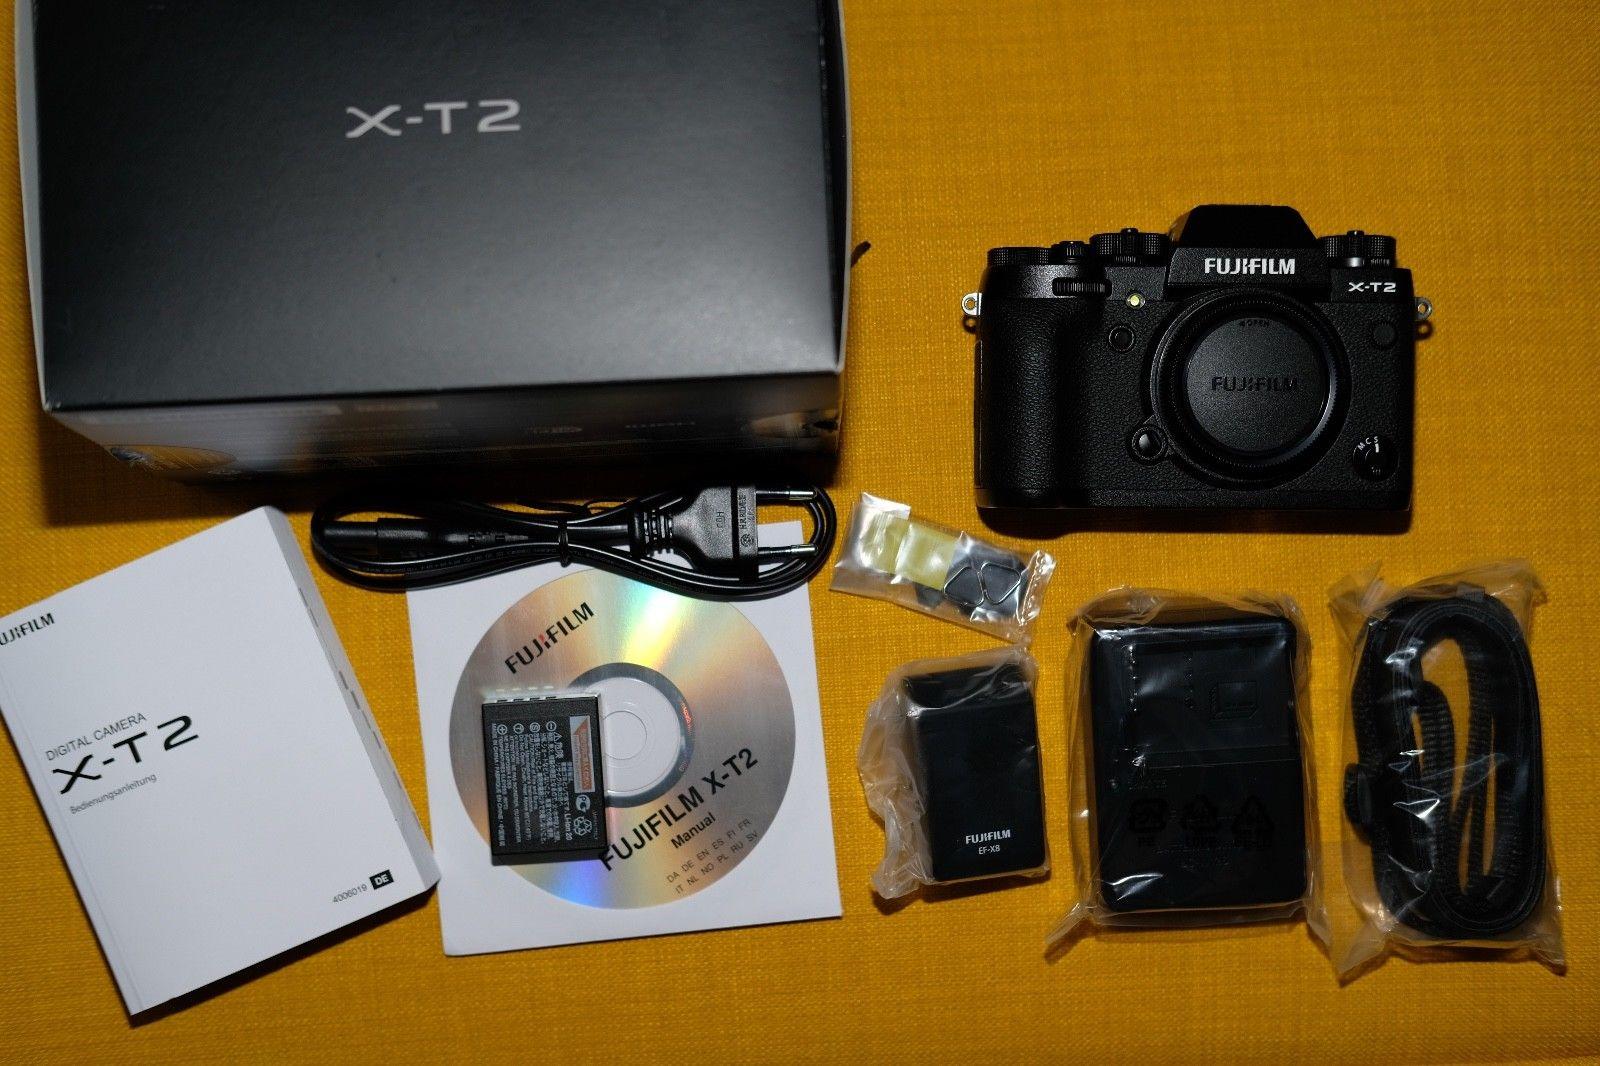 Fujifilm Fuji X-T2 schwarz TOP SUPER ZUSTAND XT2 Systemkamera Body Gehäuse